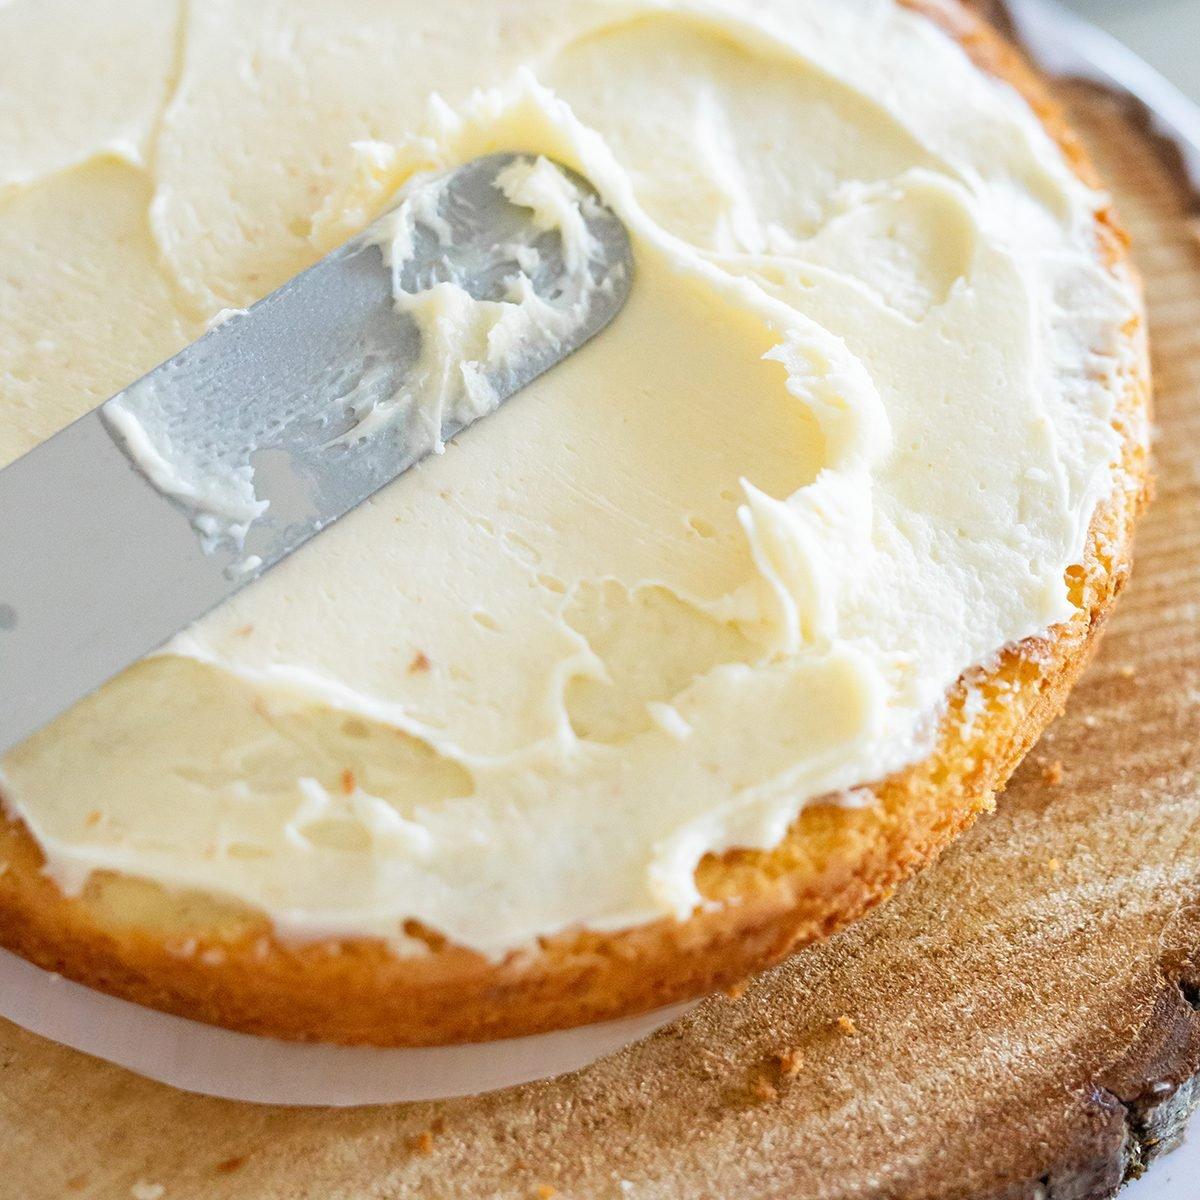 woman icing vanilla cake with metal spatula ; Shutterstock ID 1485154997; Job (TFH, TOH, RD, BNB, CWM, CM): TOH